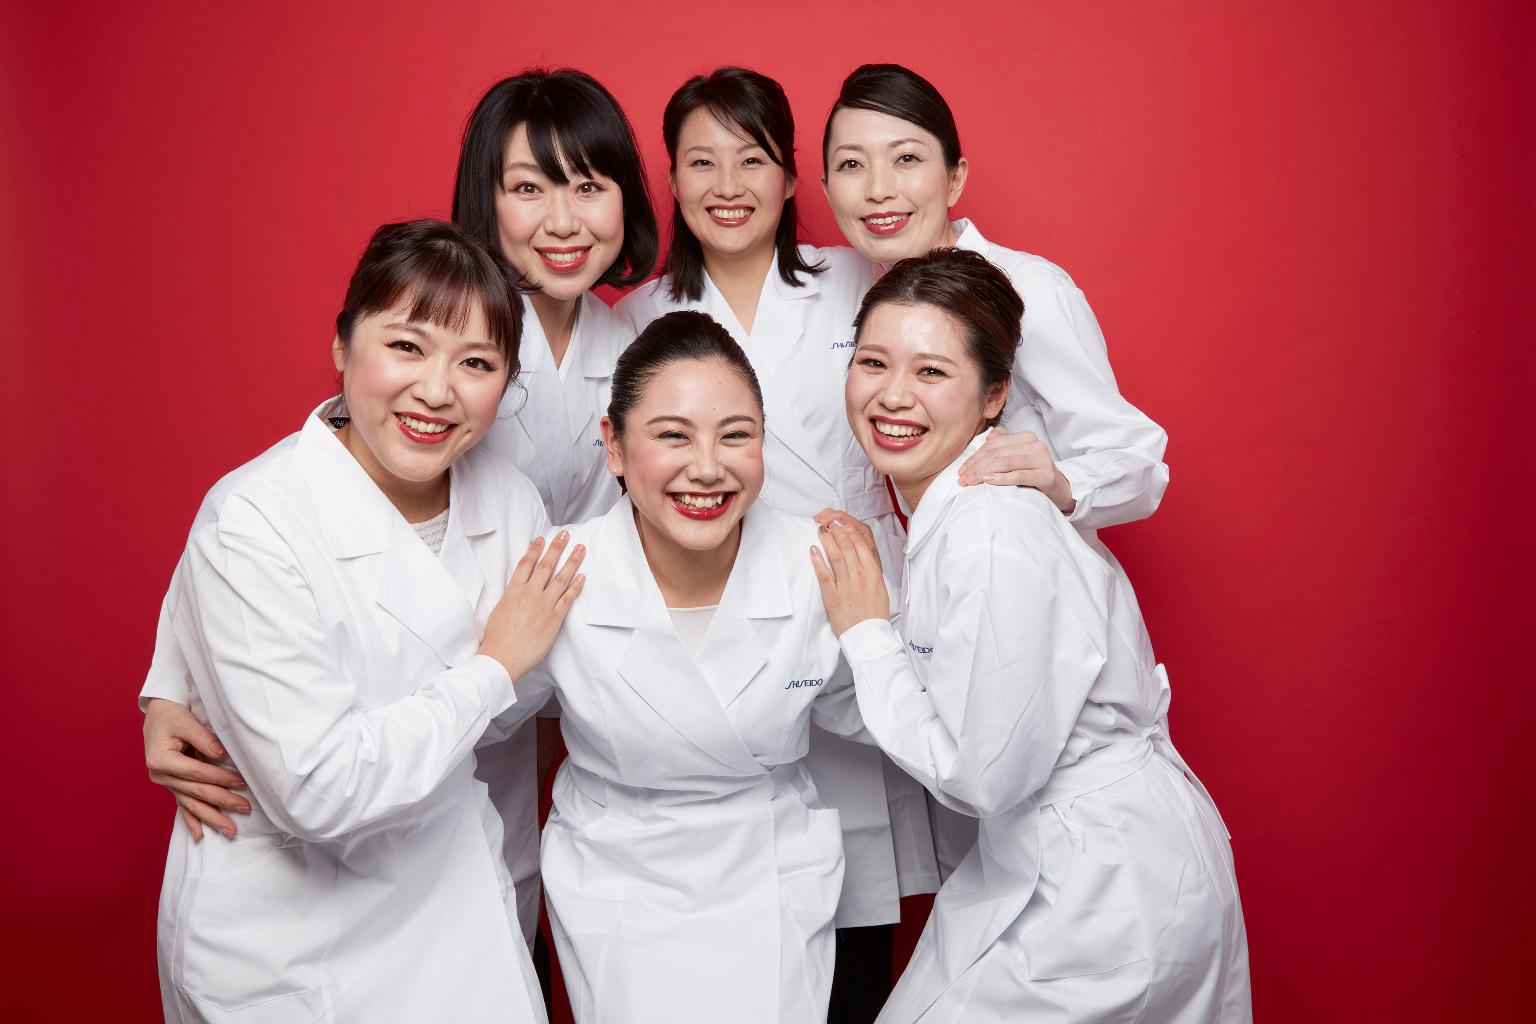 miss shiseido 5